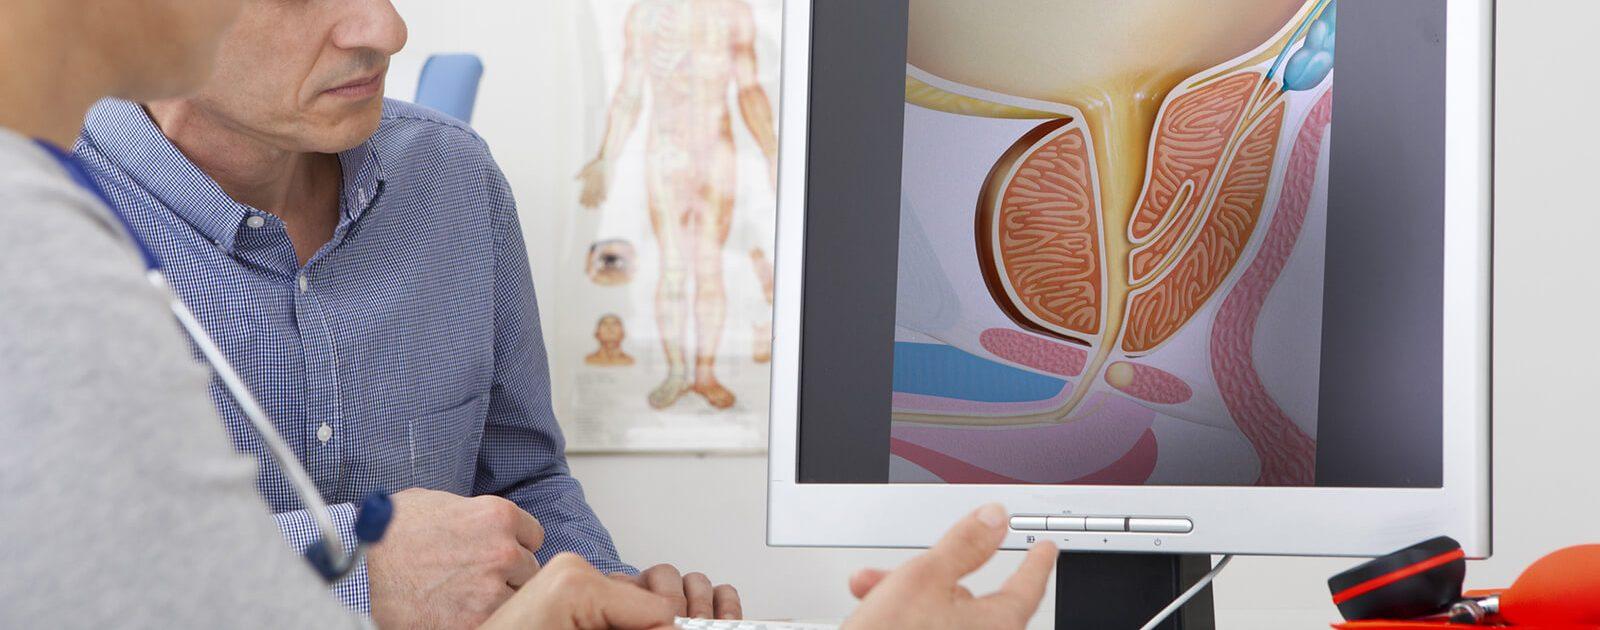 Prostatitis-Patient im Diagnosegespräch mit dem Arzt